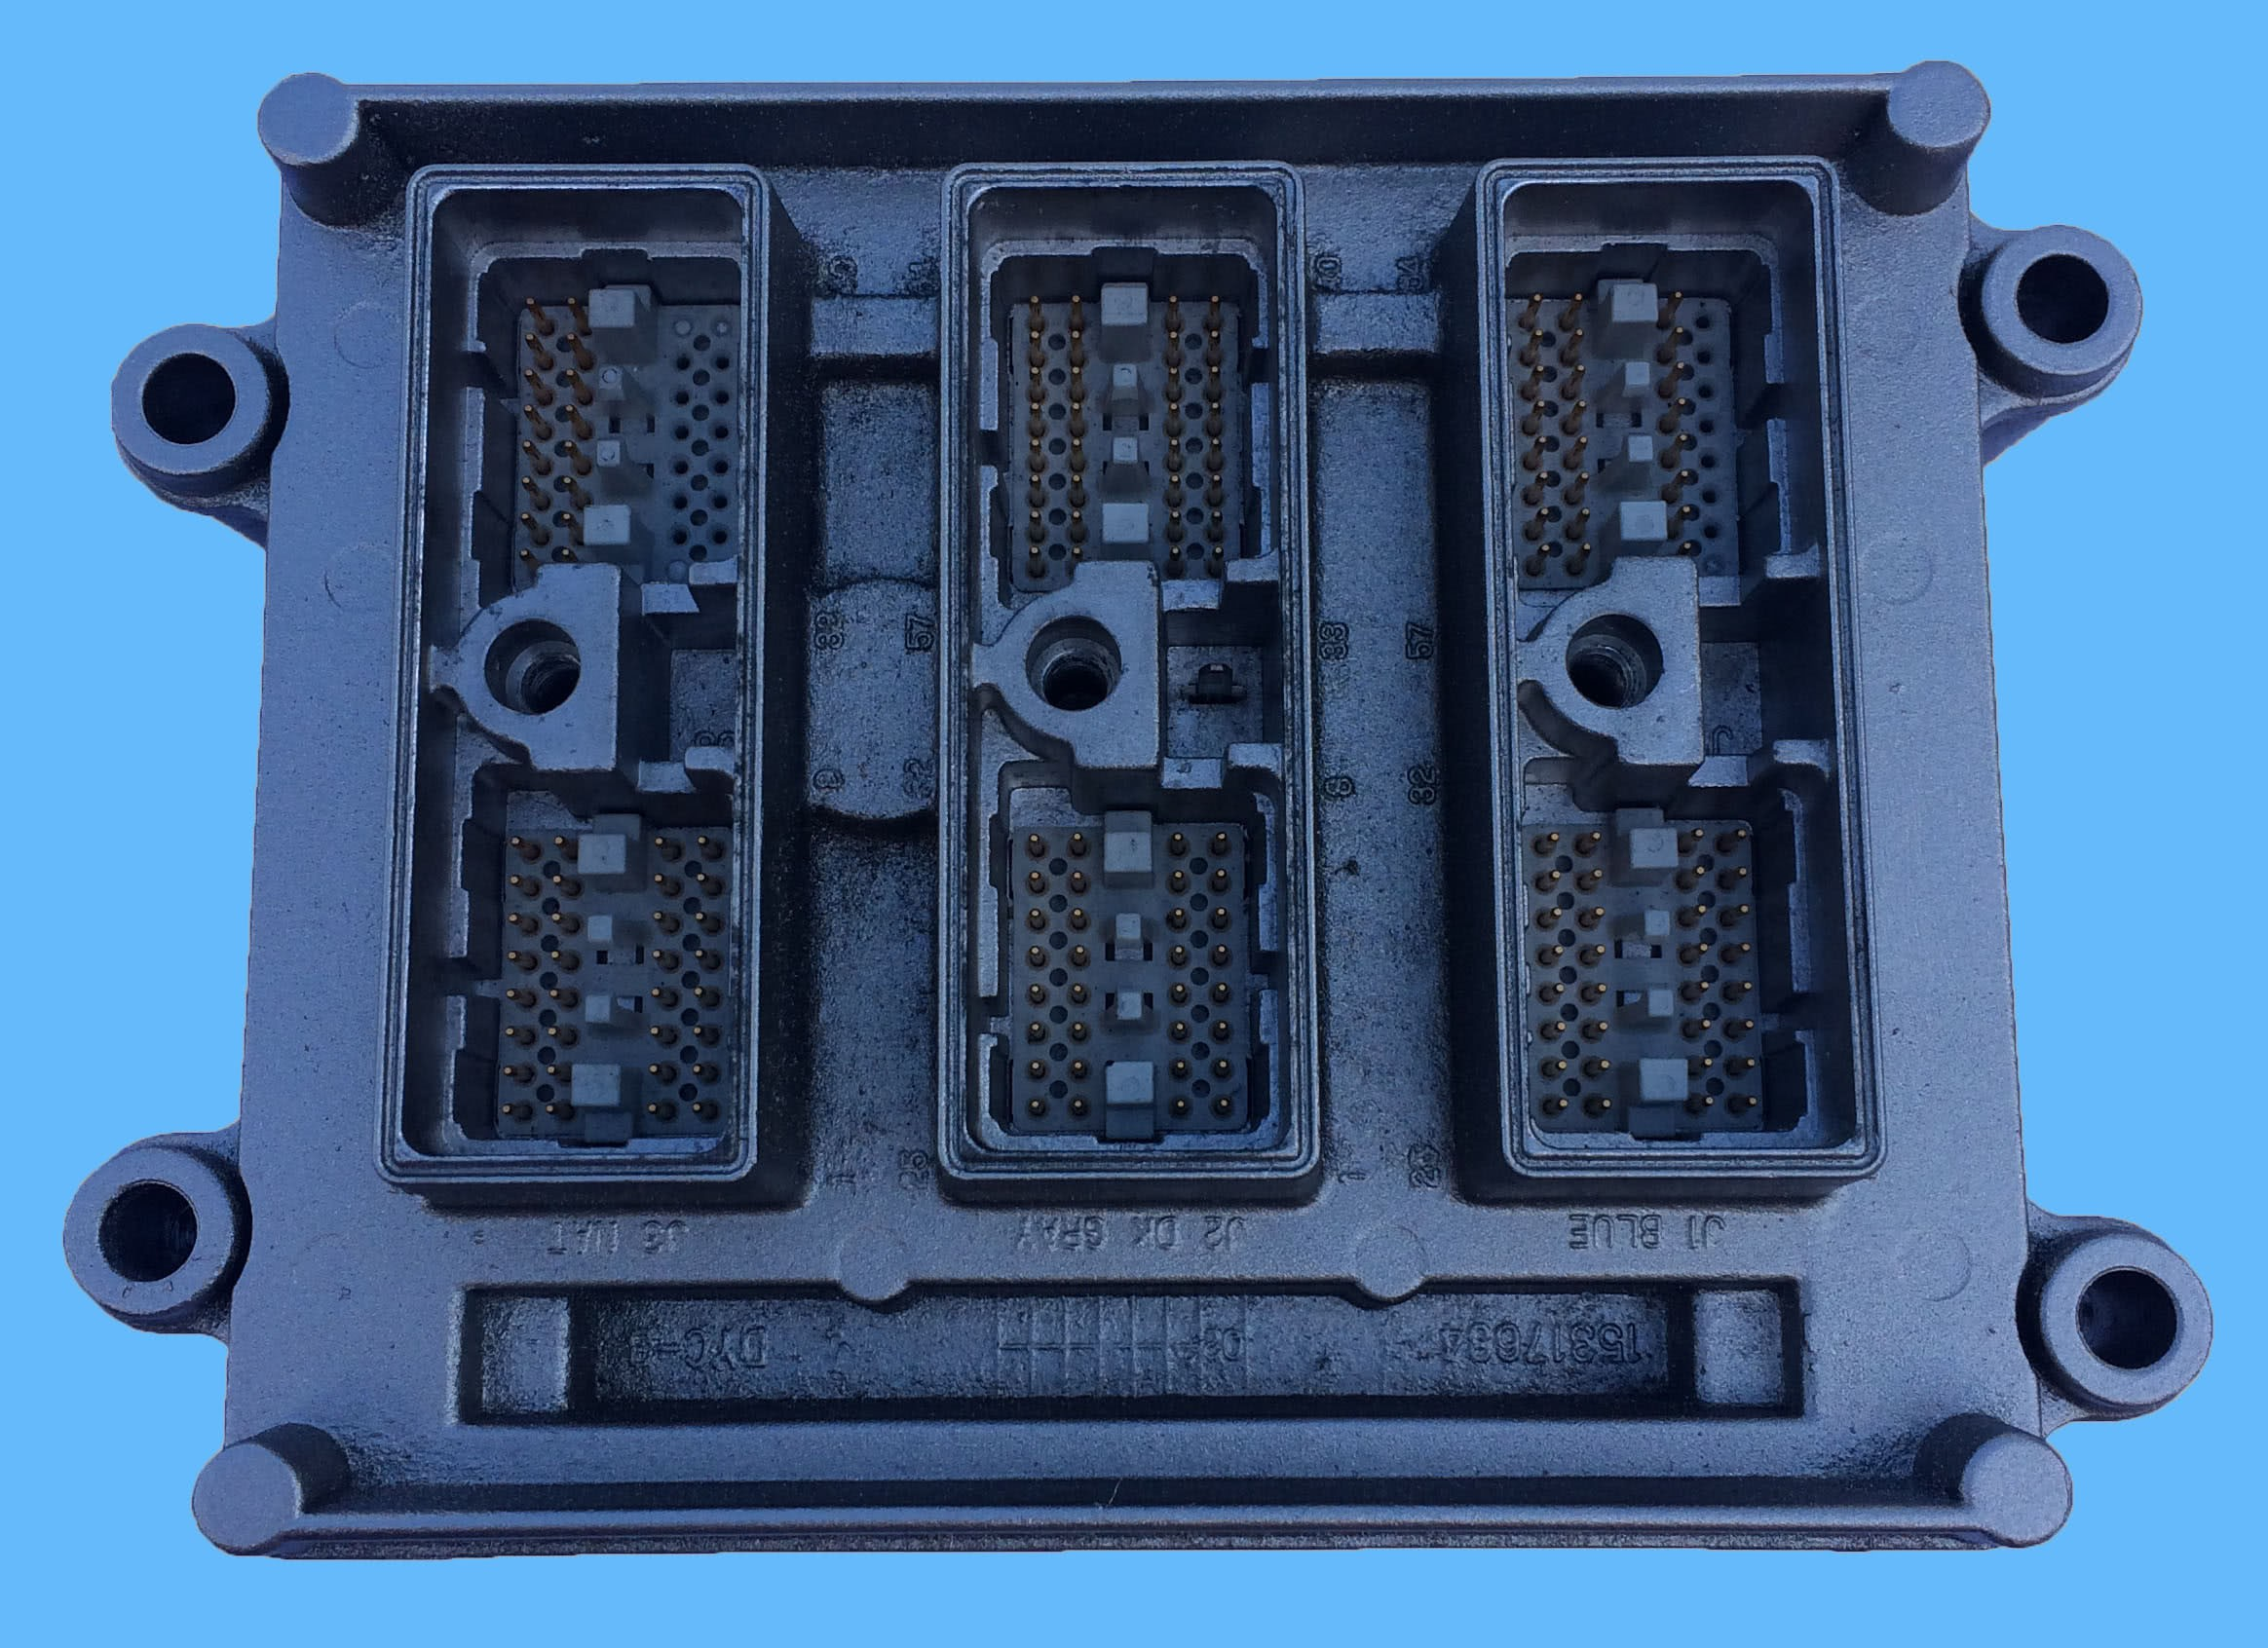 2002 Chevrolet Trailblazer EXT 4.2L V6 Gas Engine Control Module ECM / ECU - Engine Control Module